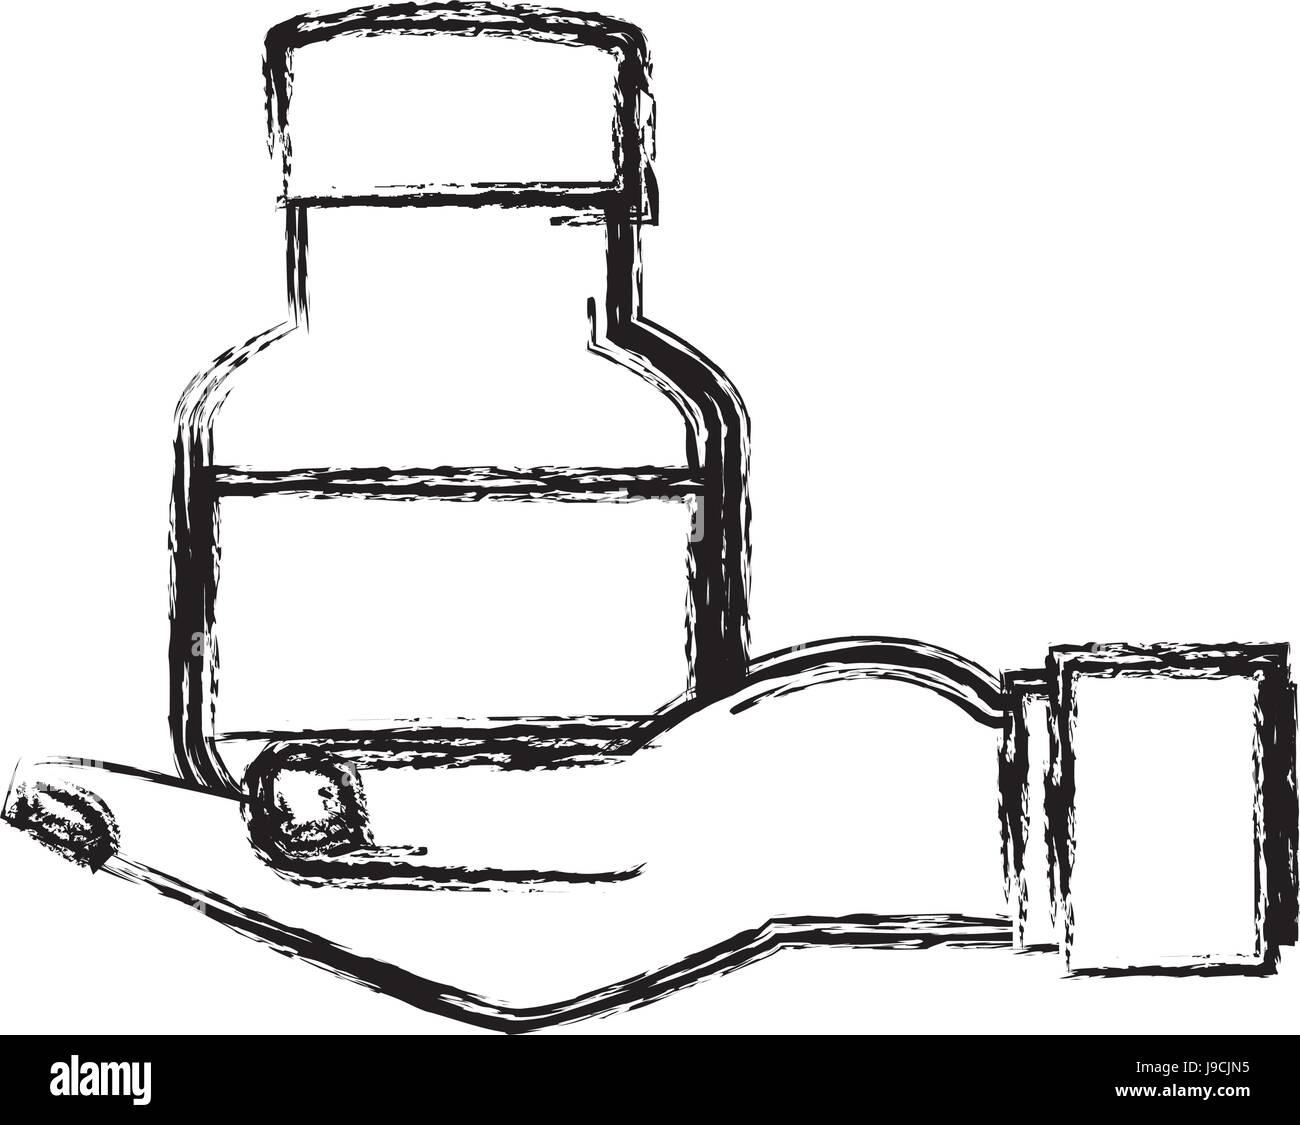 human hand holding bottle medicine pet care sketch - Stock Vector